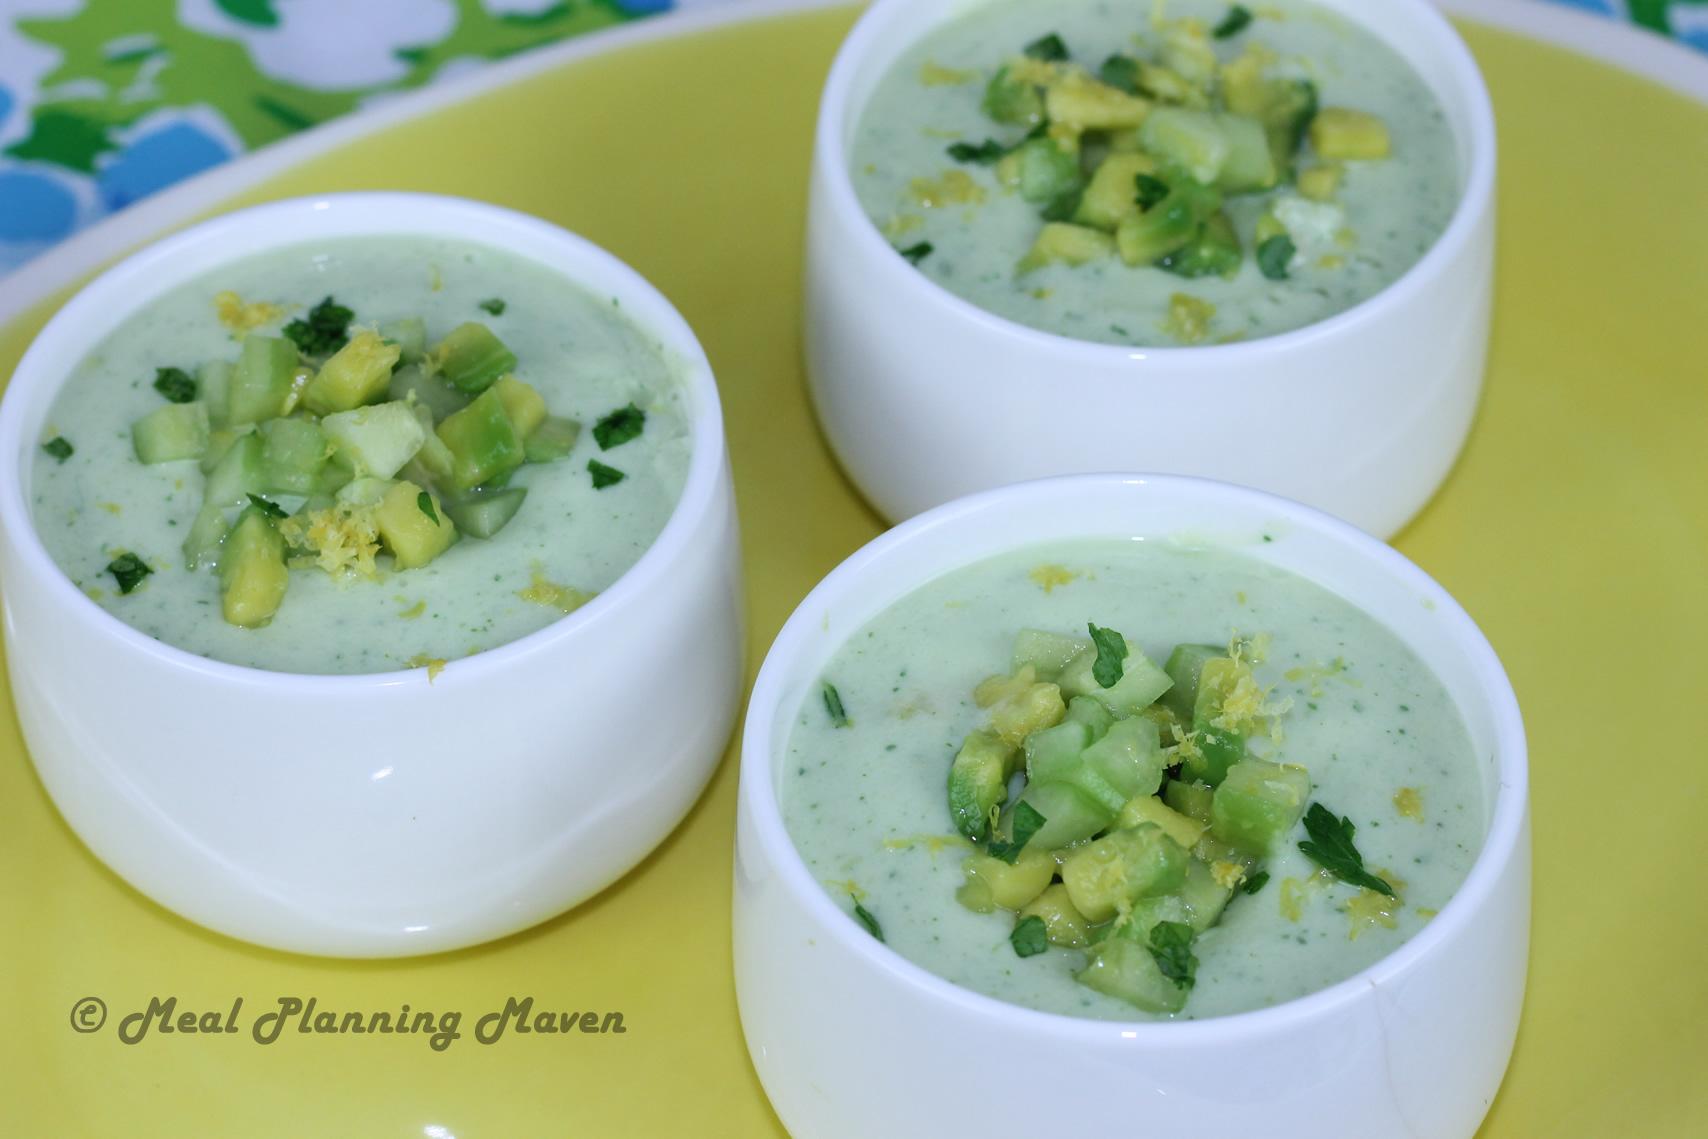 Jenn's Chilled Cucumber-Avocado Soup